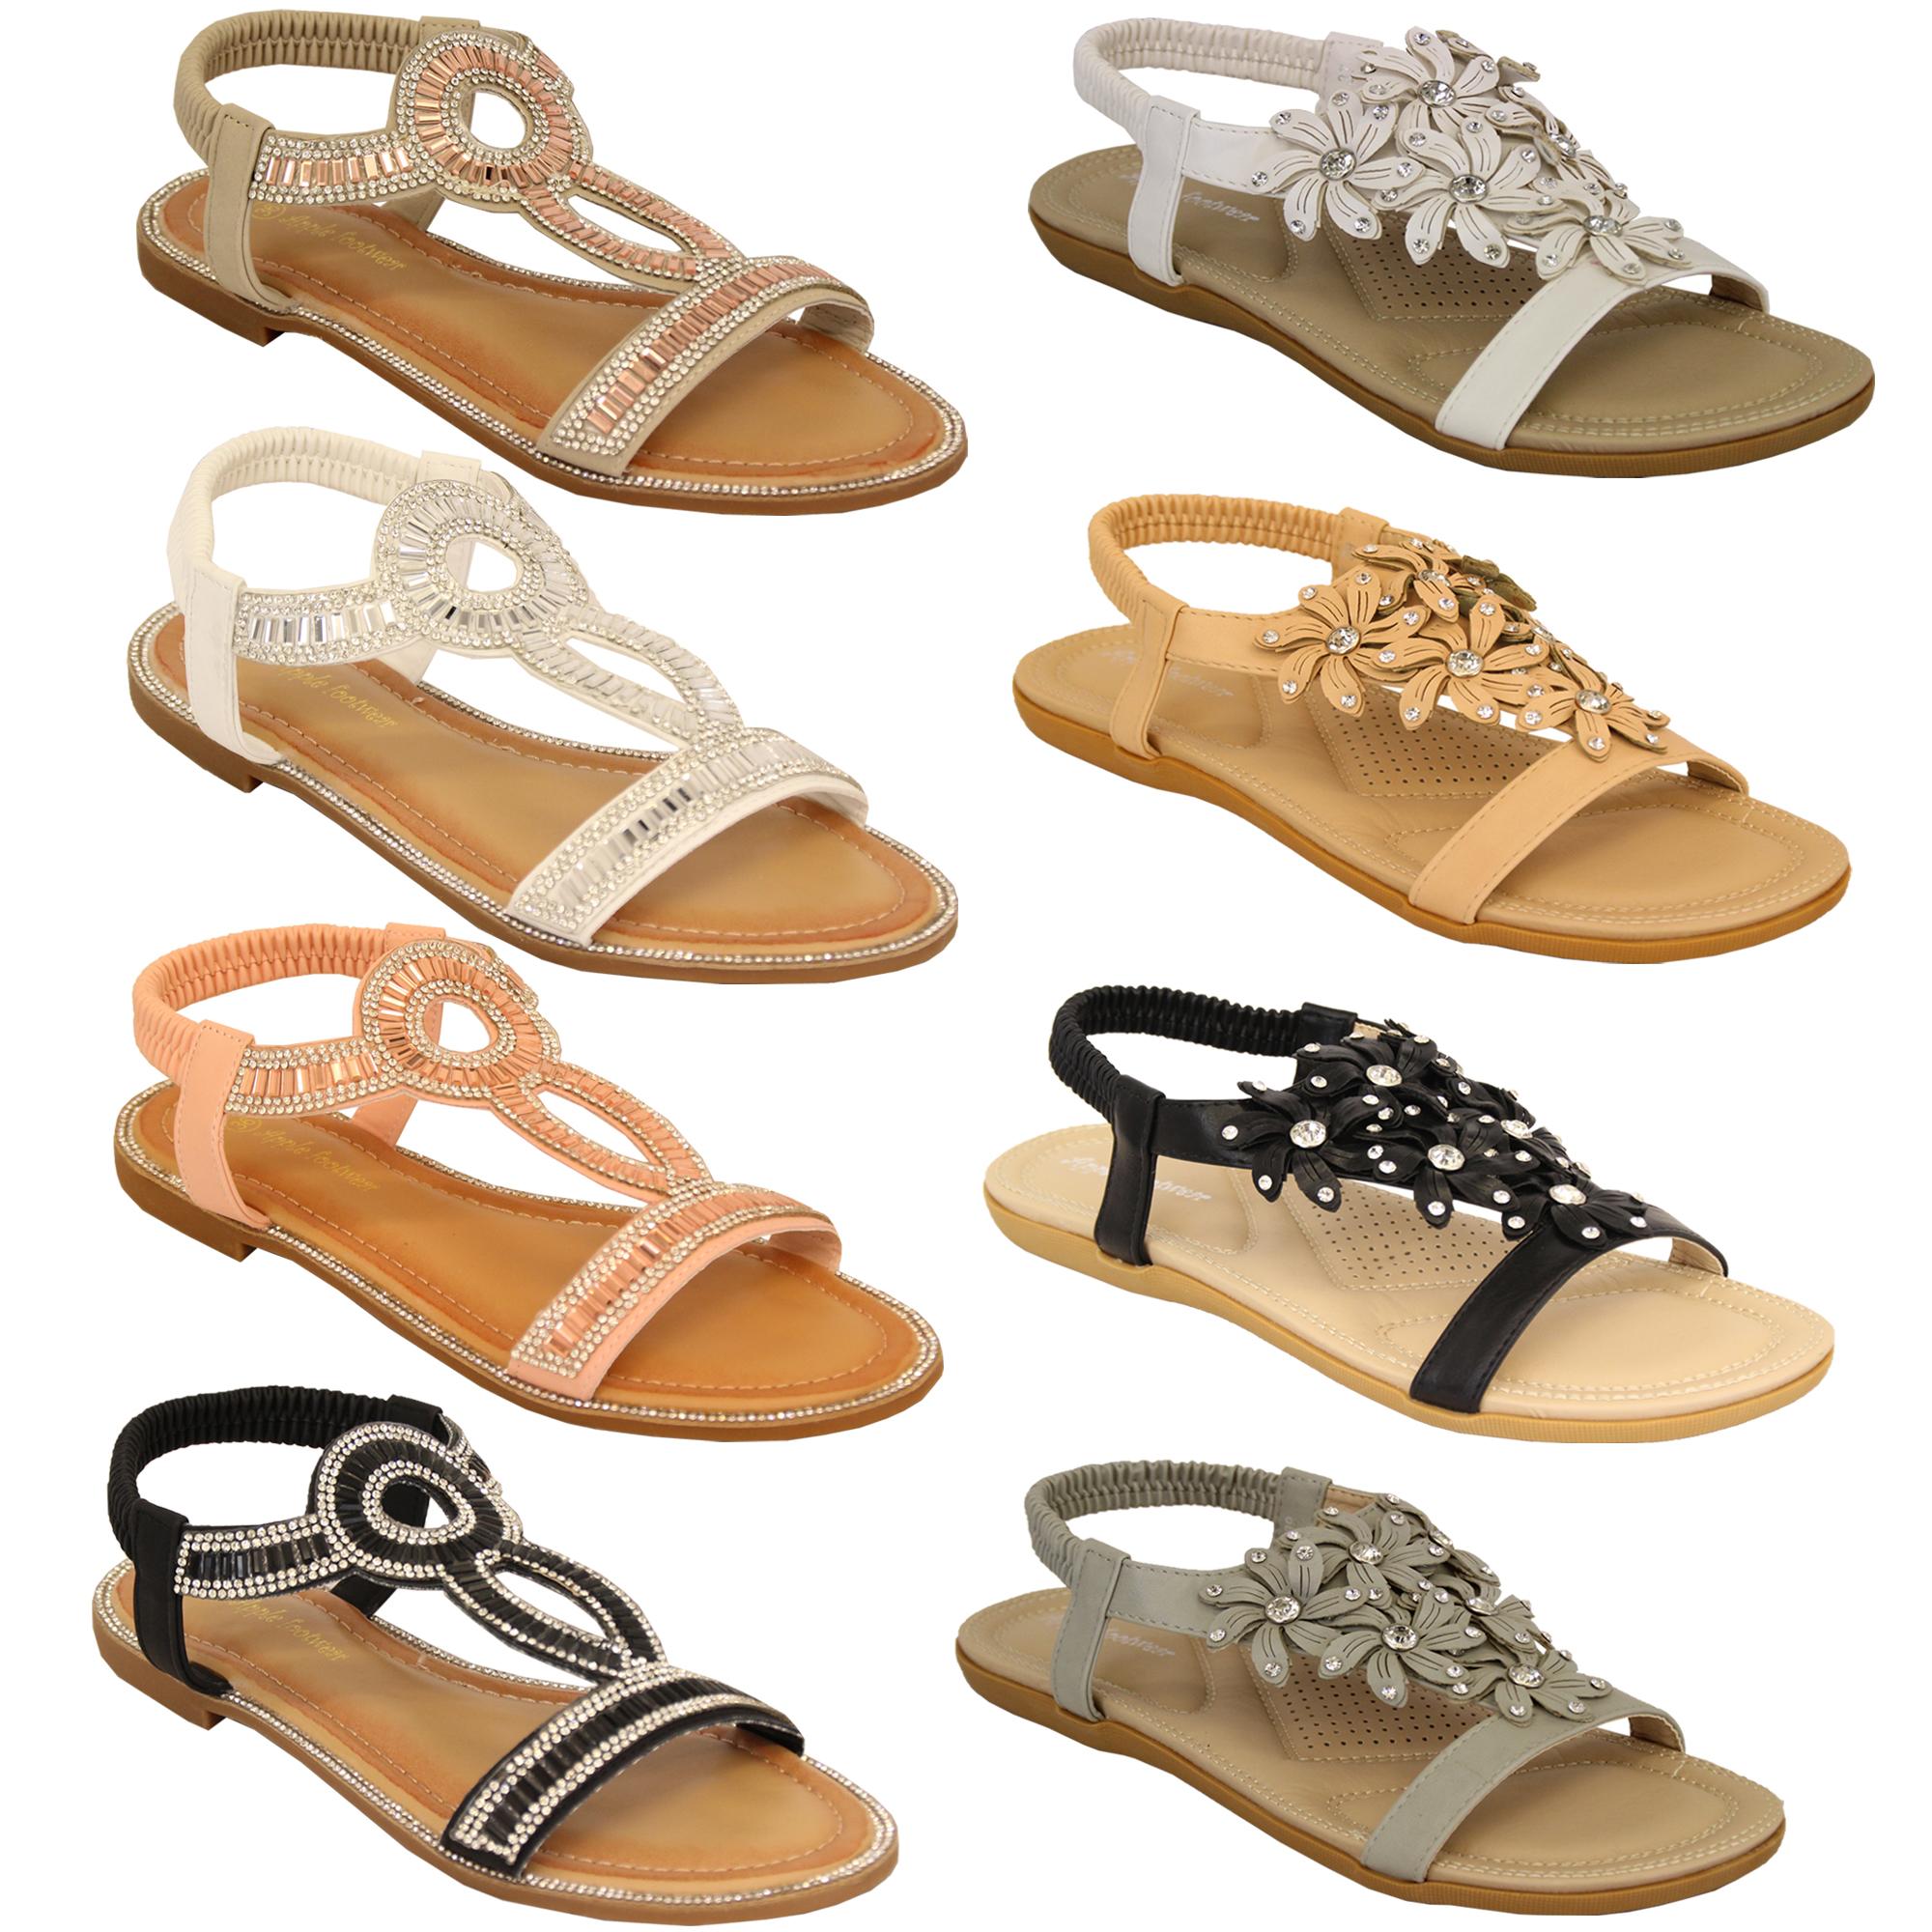 9c04ec93342a Ladies Flat Slip On Sandals Womens Diamante Sling Back Open Toe ...